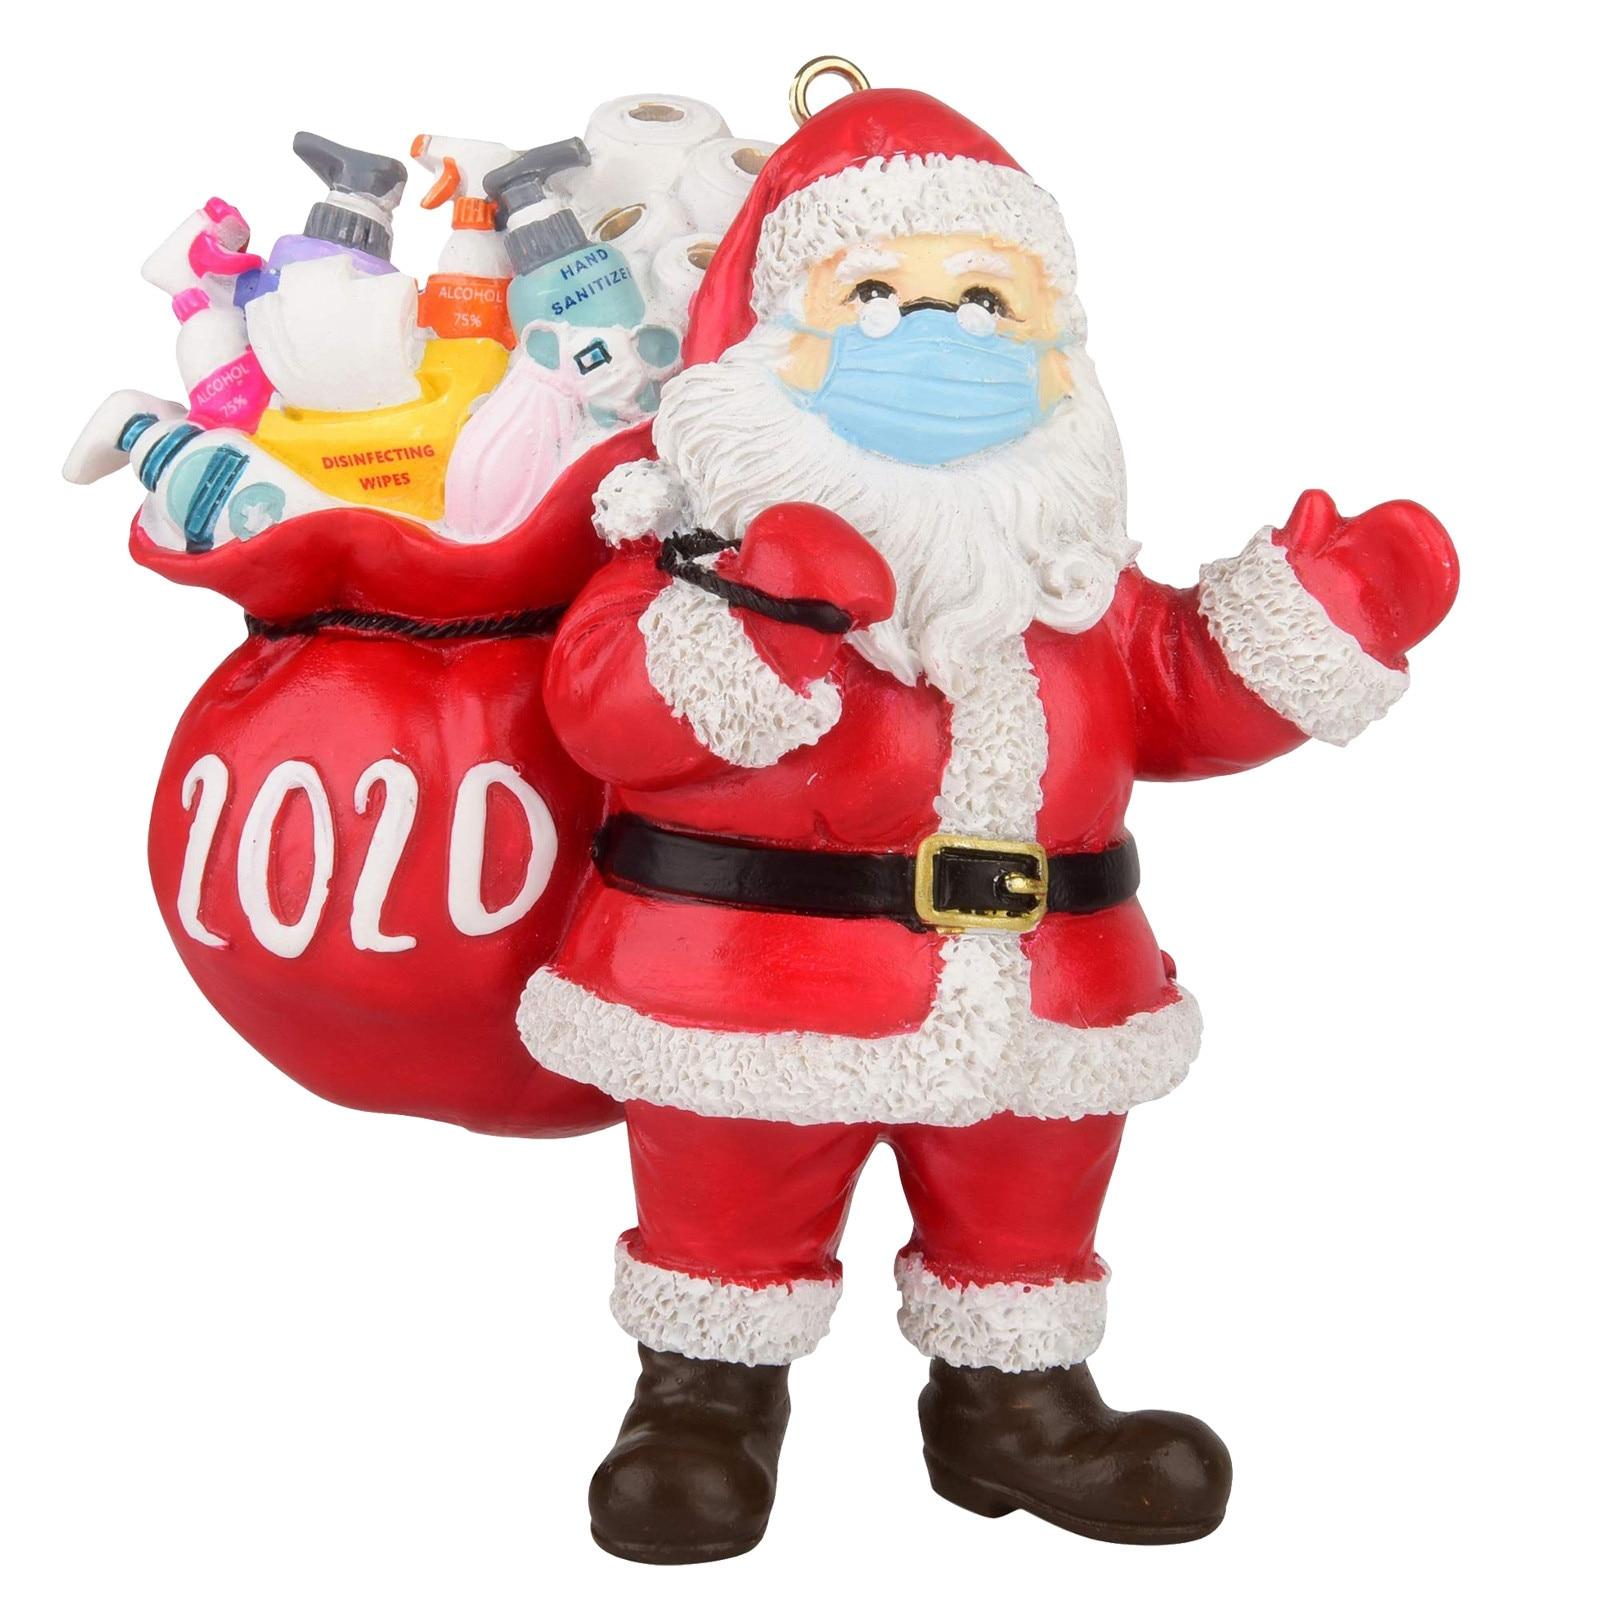 Santa Claus Ornament - Avanti-eStore